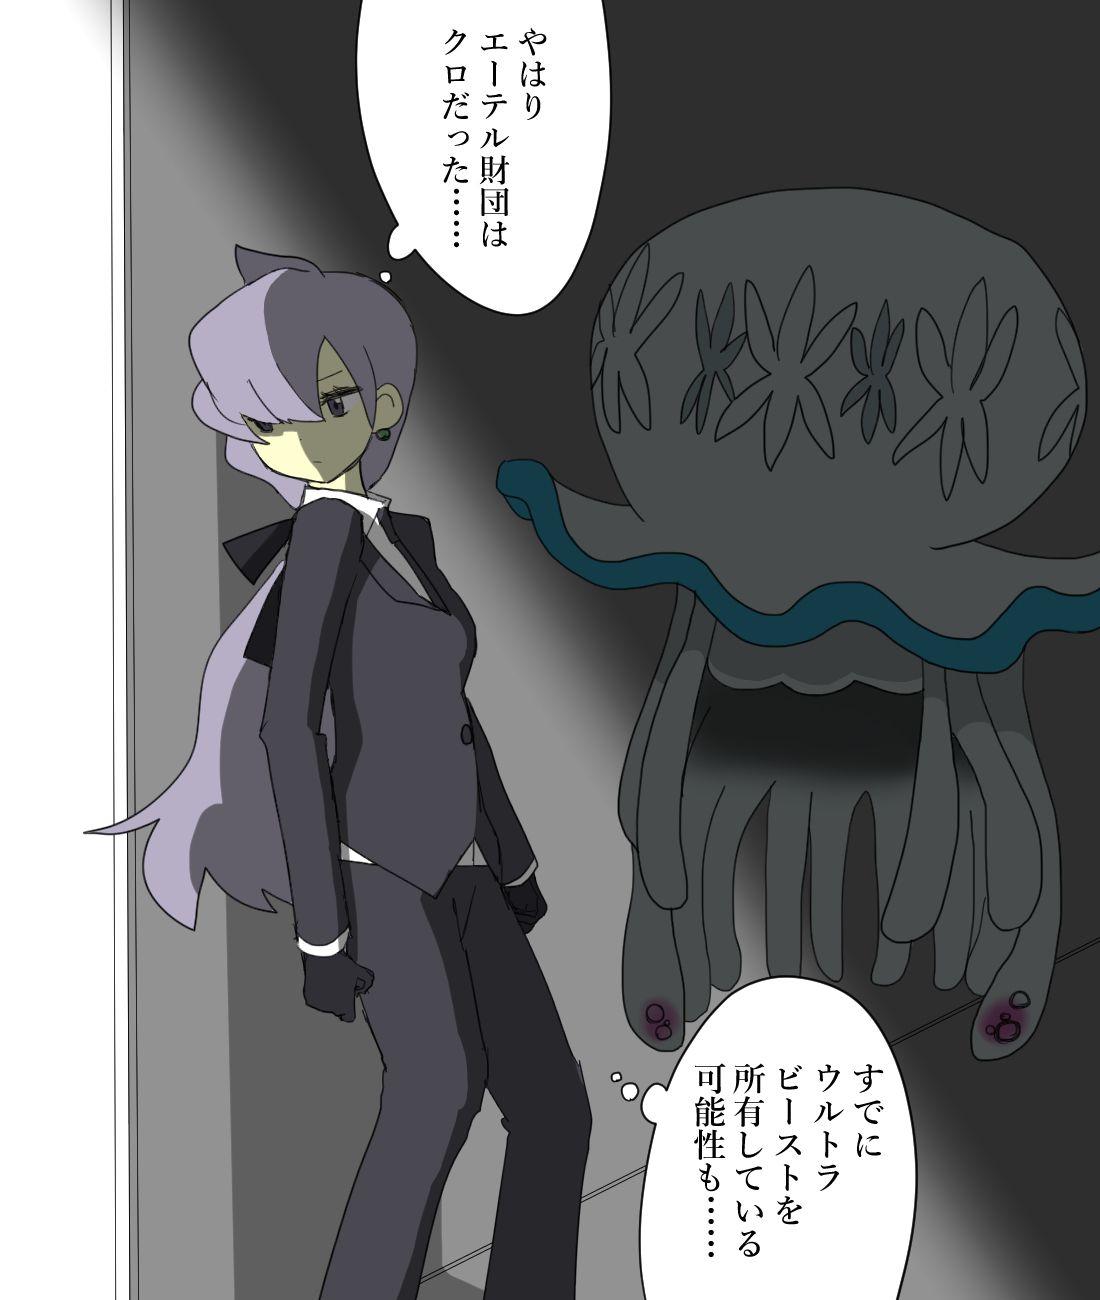 anabel_(pokemon)007